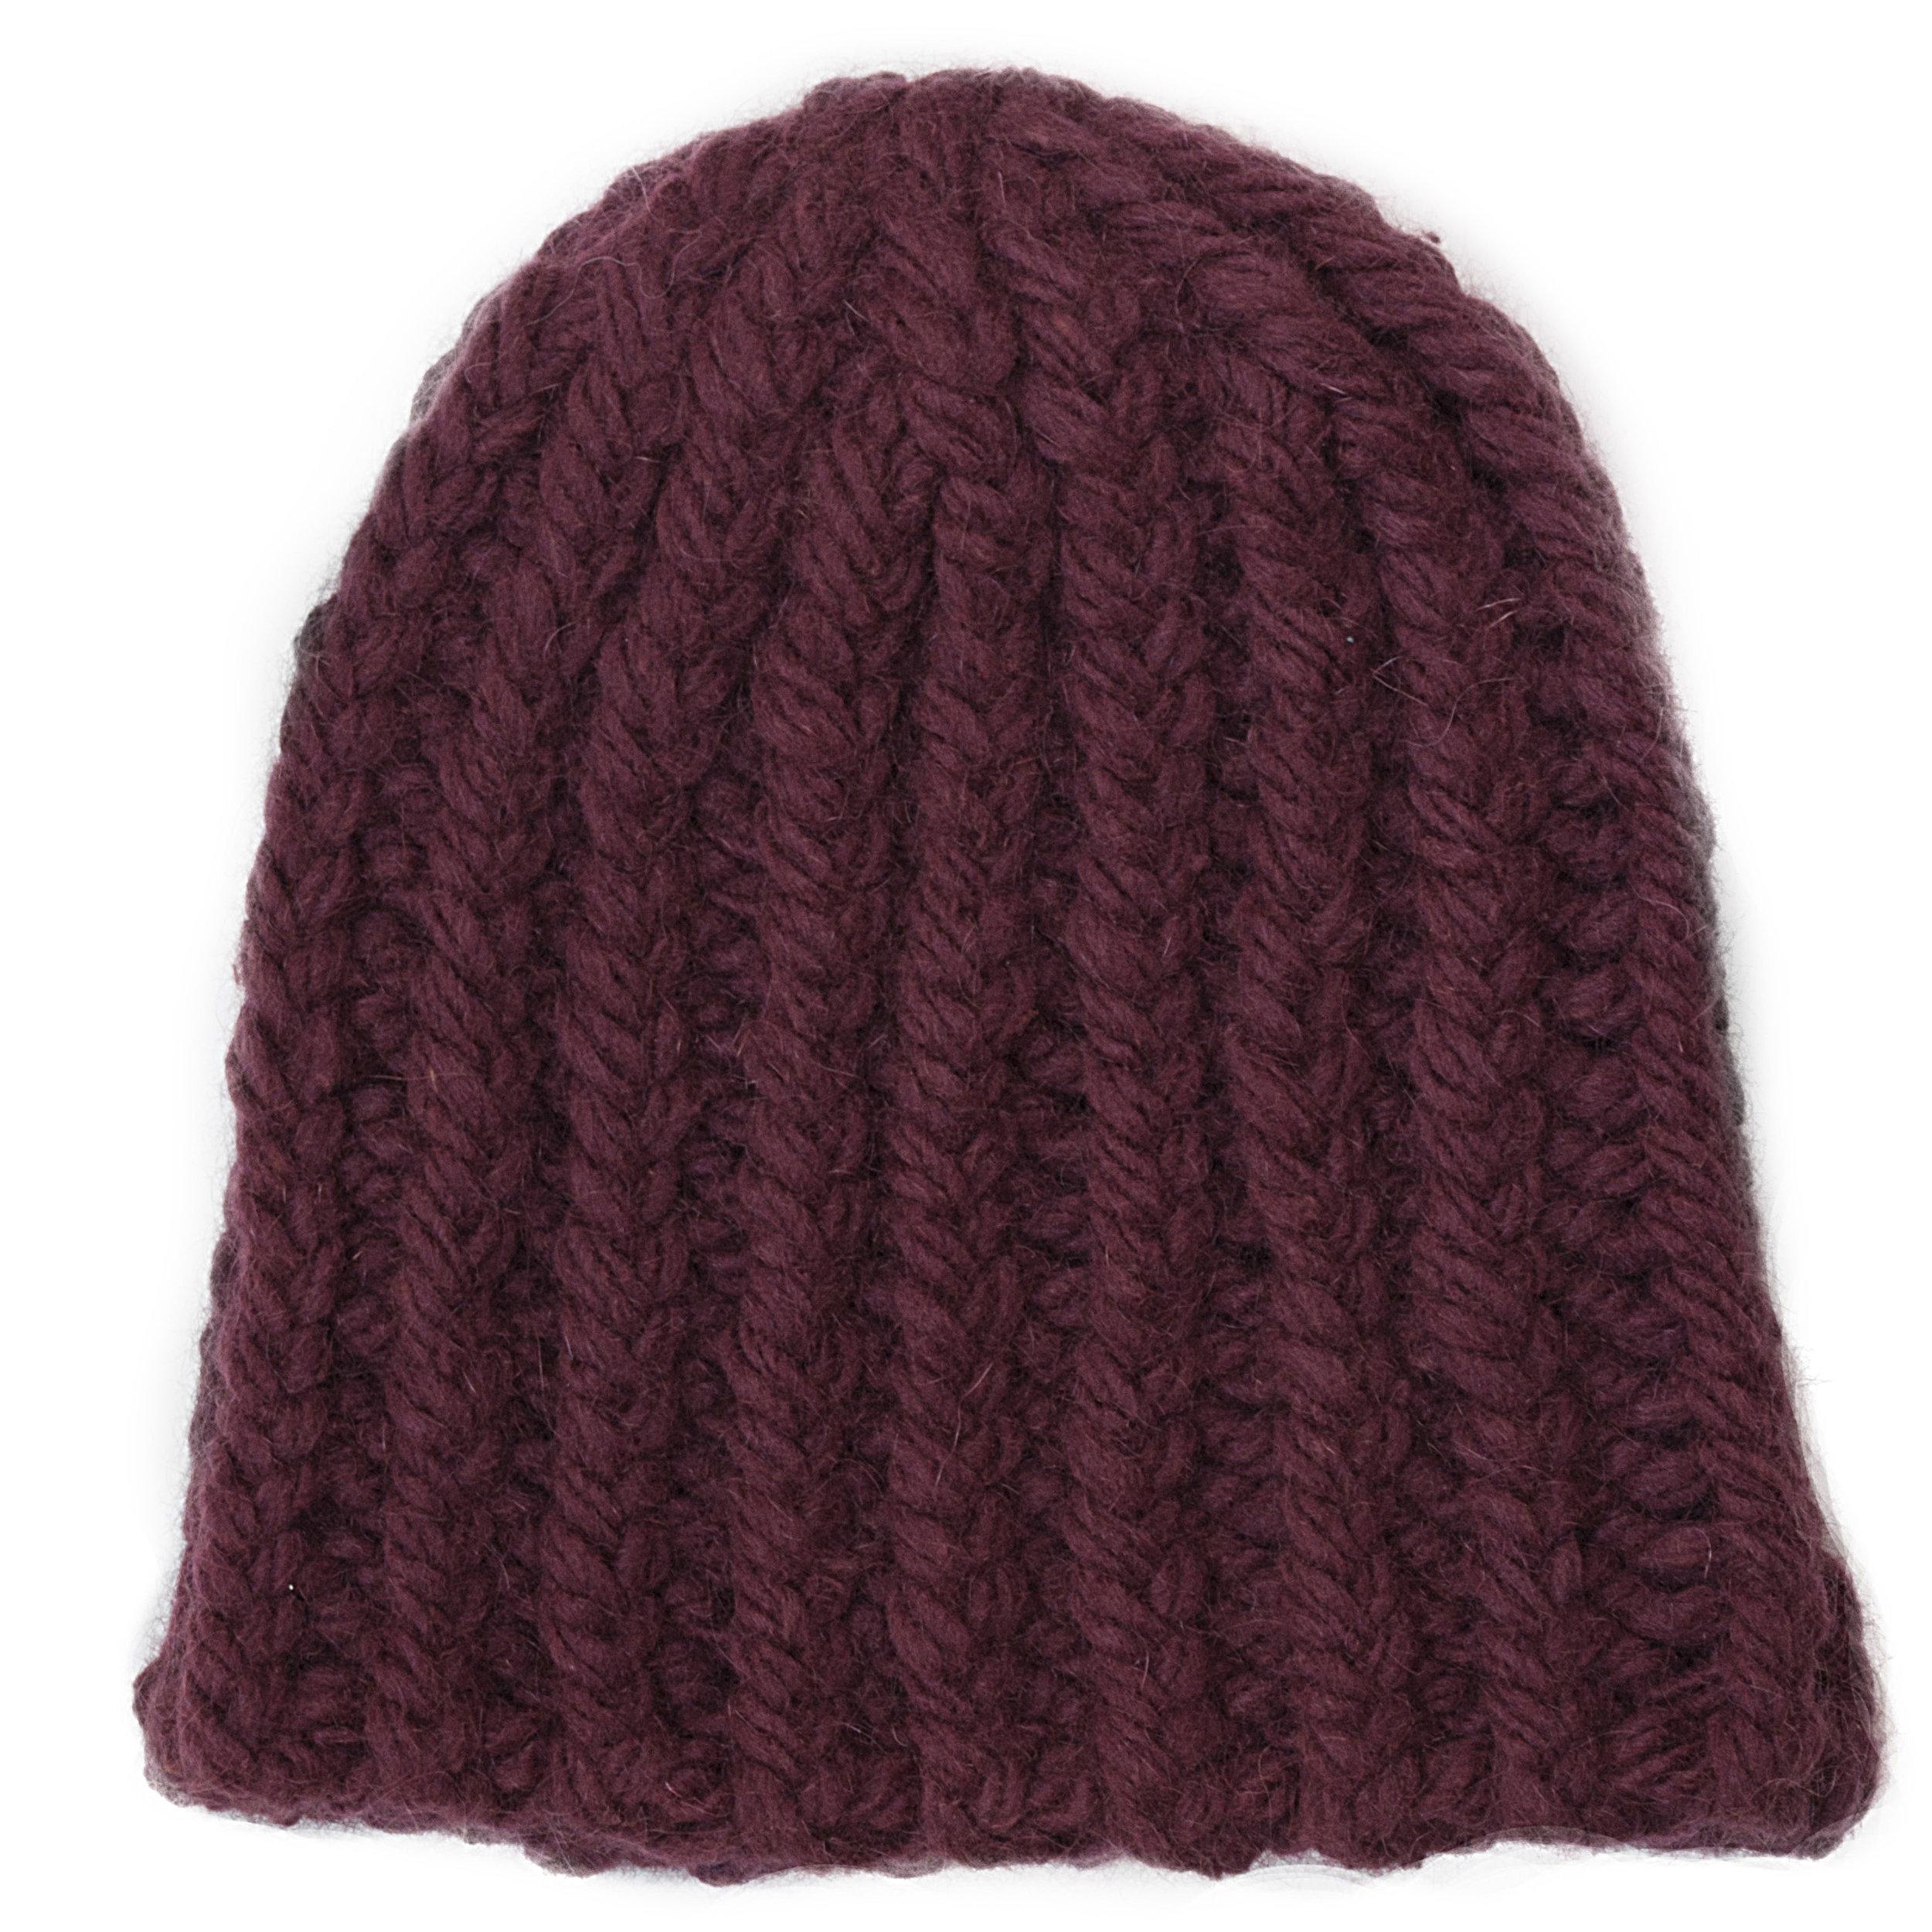 592ebbd0024 Chunky Twisted Ribbed Beanie Hat - Garnet — Josh Bennett NYC